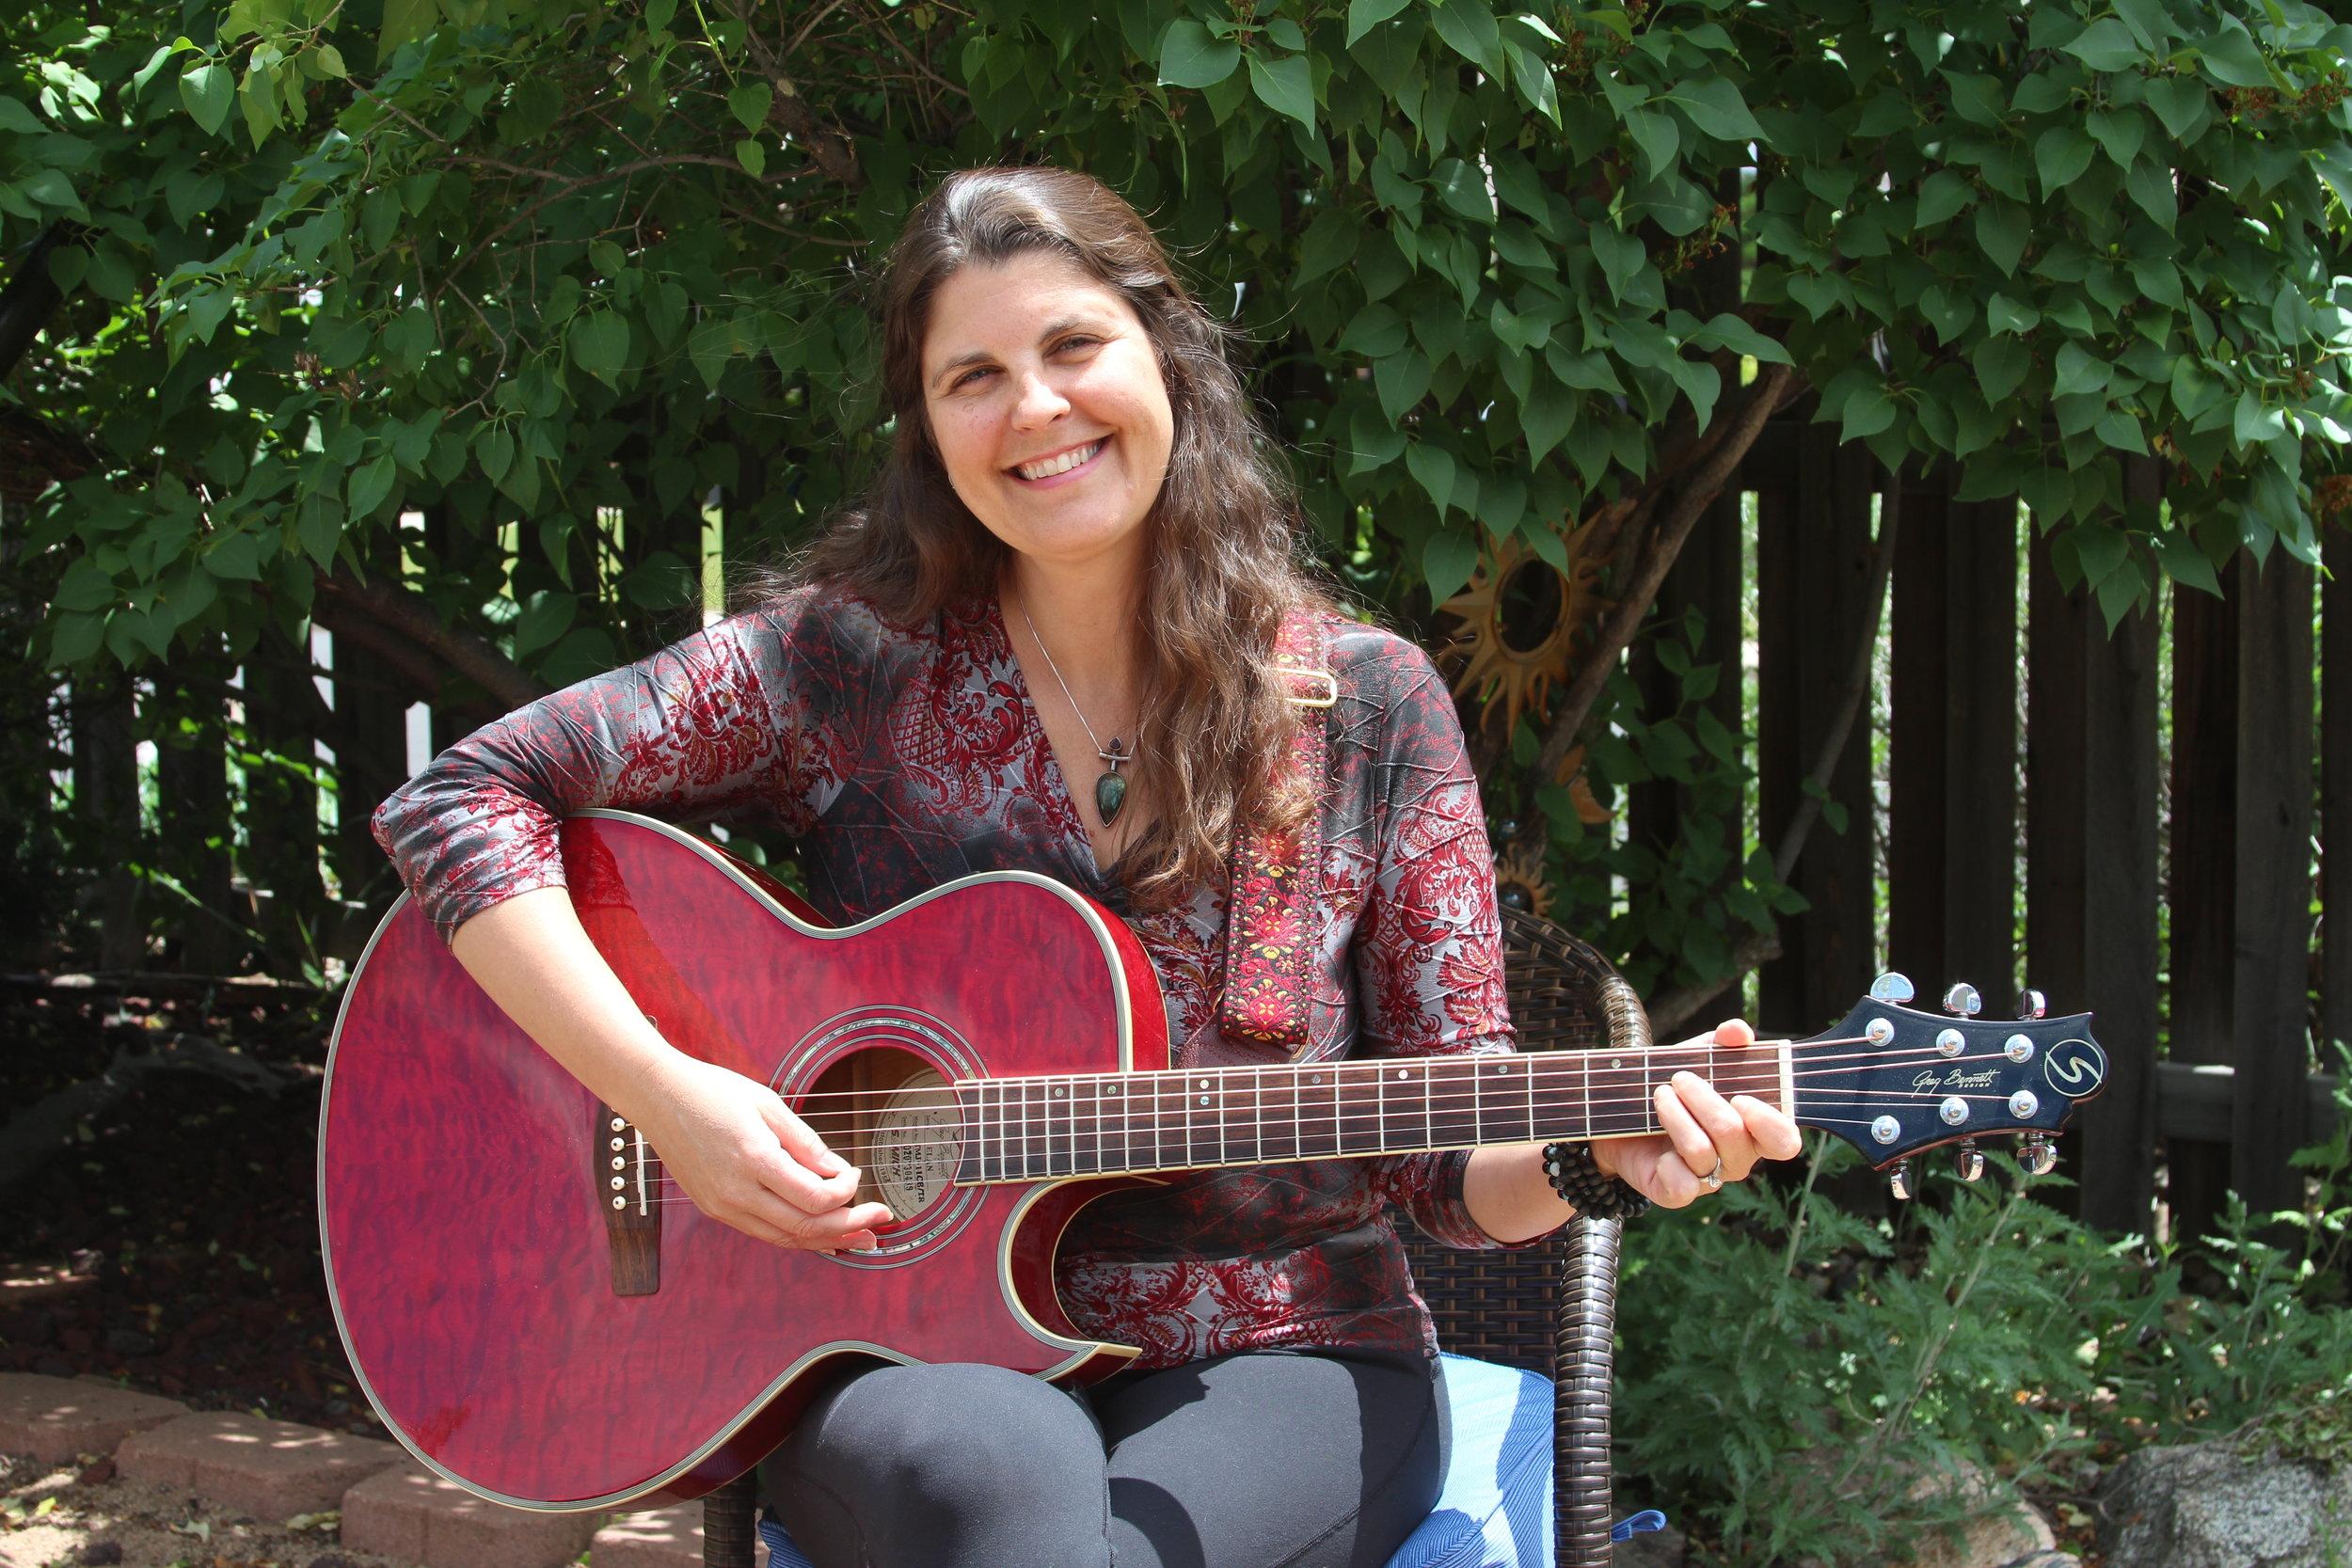 Lisa guitar pix.JPG